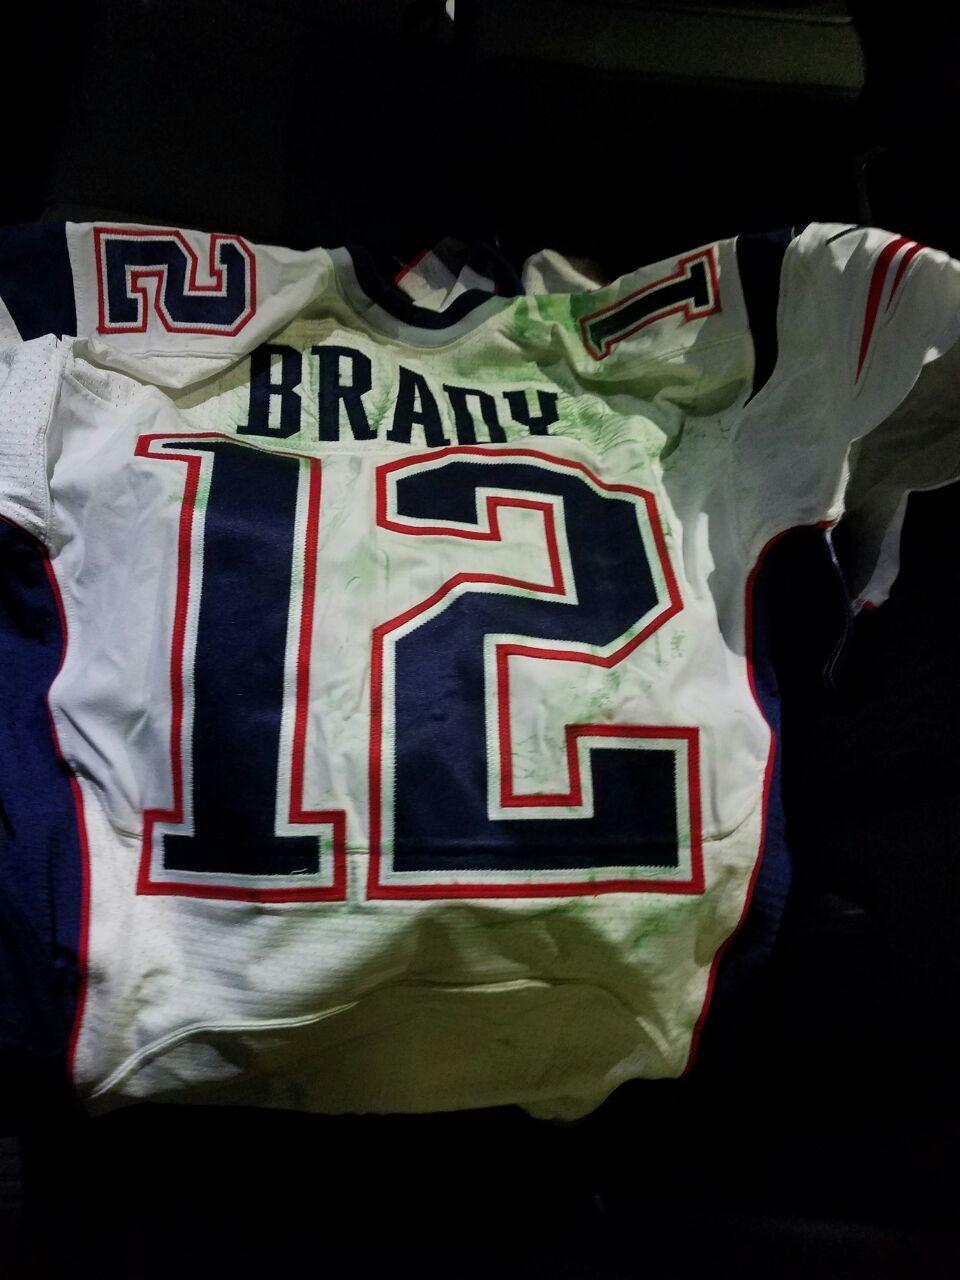 Brady jersey theft suspect spent Super Bowl week taking ...